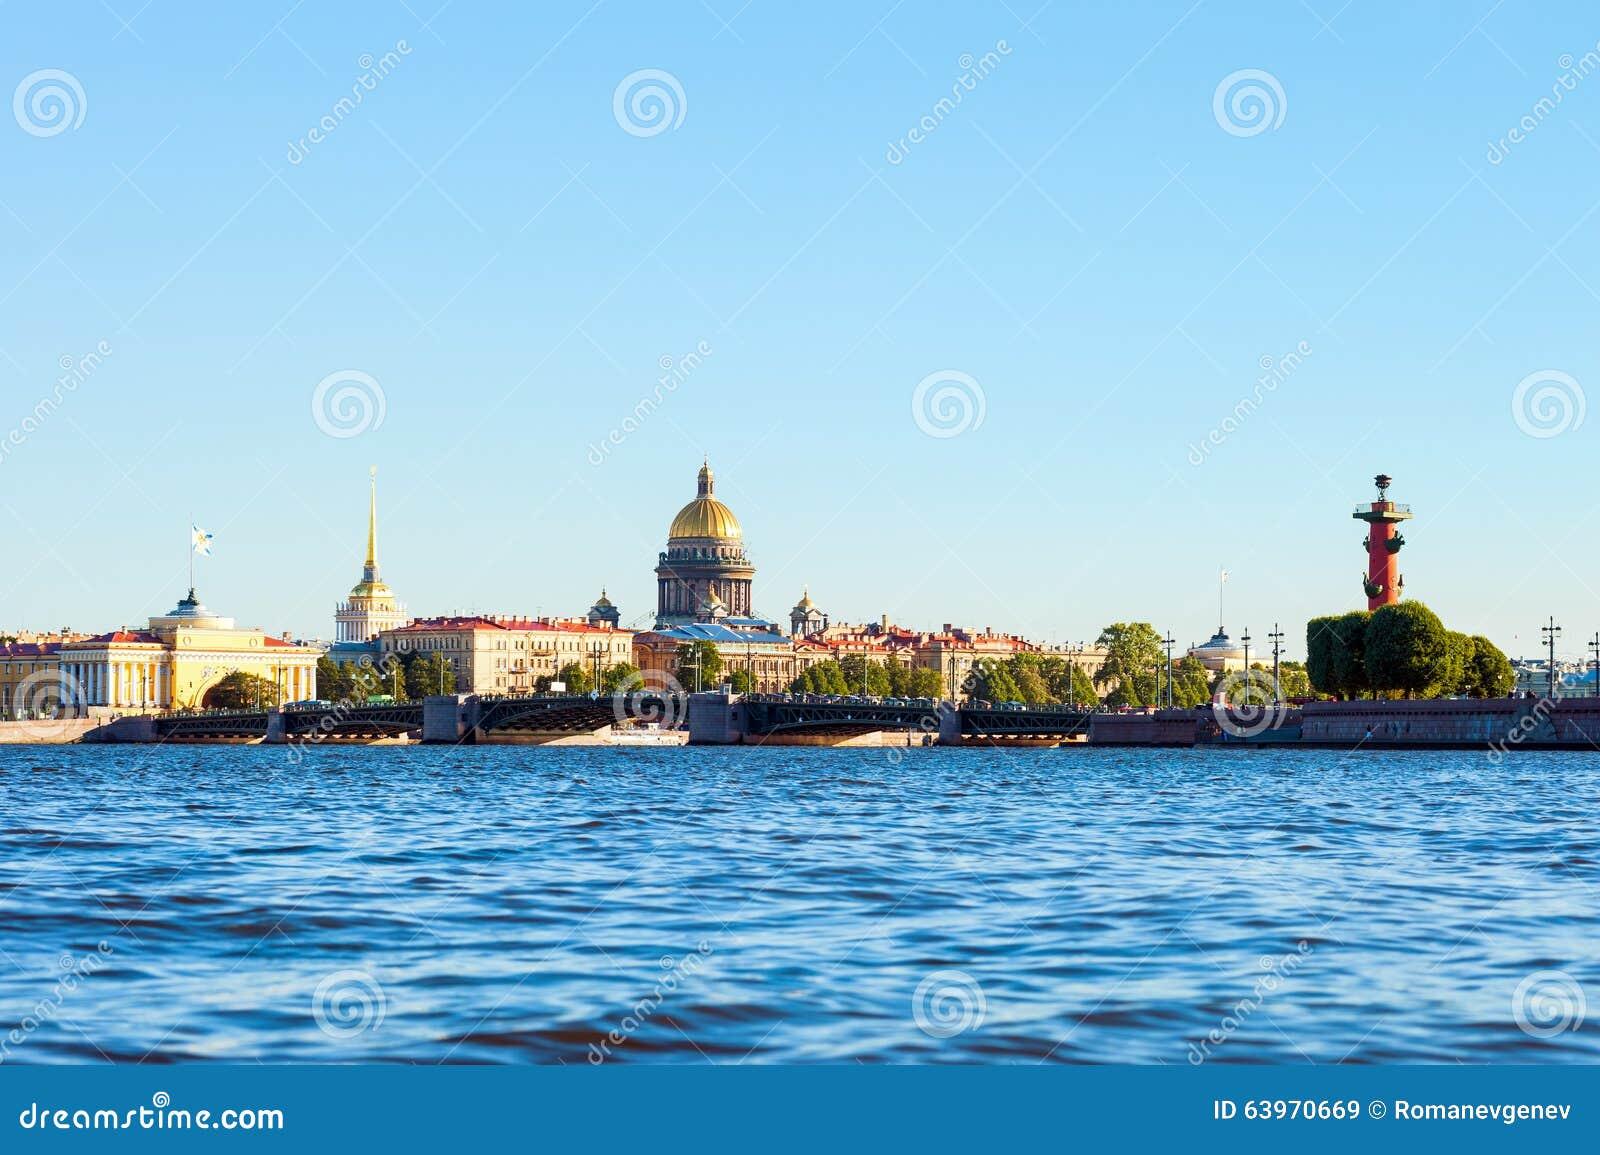 Neva Bay, St. Petersburg: description 54